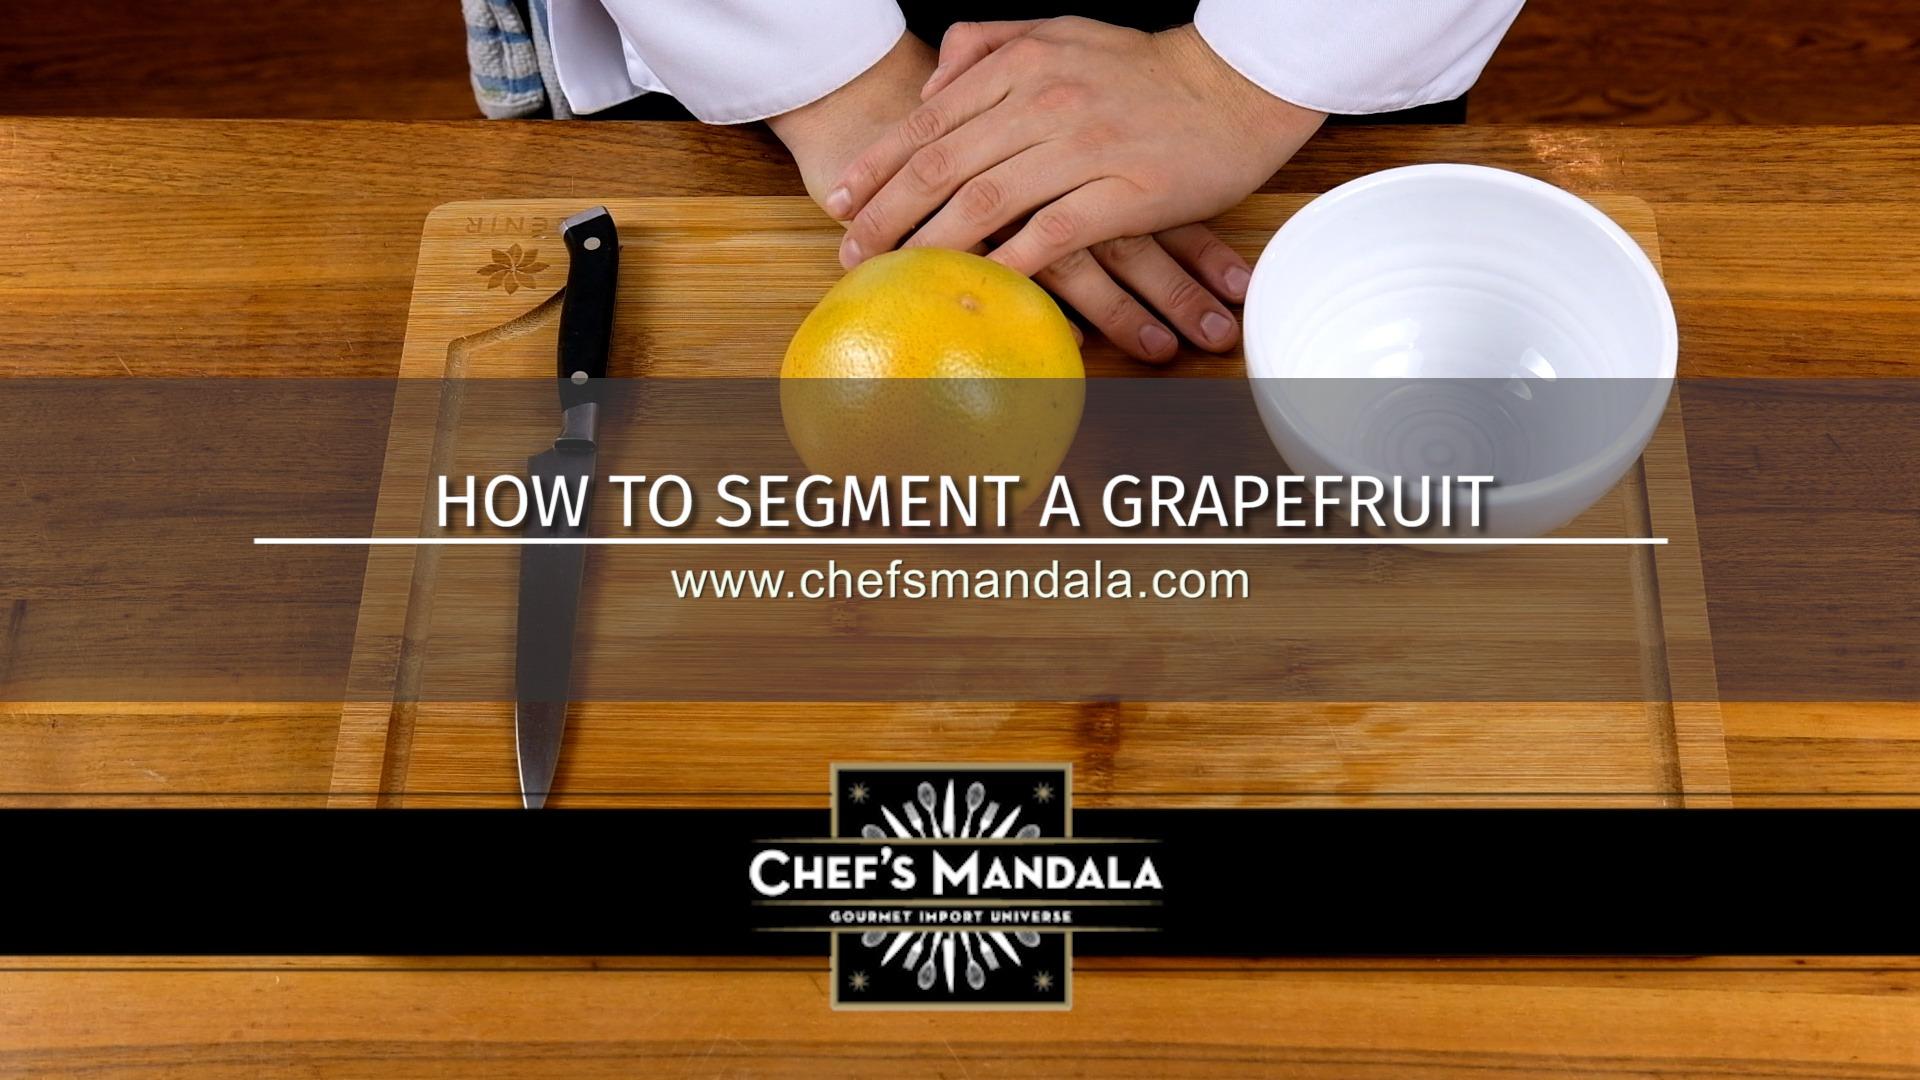 HOW TO CUT A GRAPEFRUIT